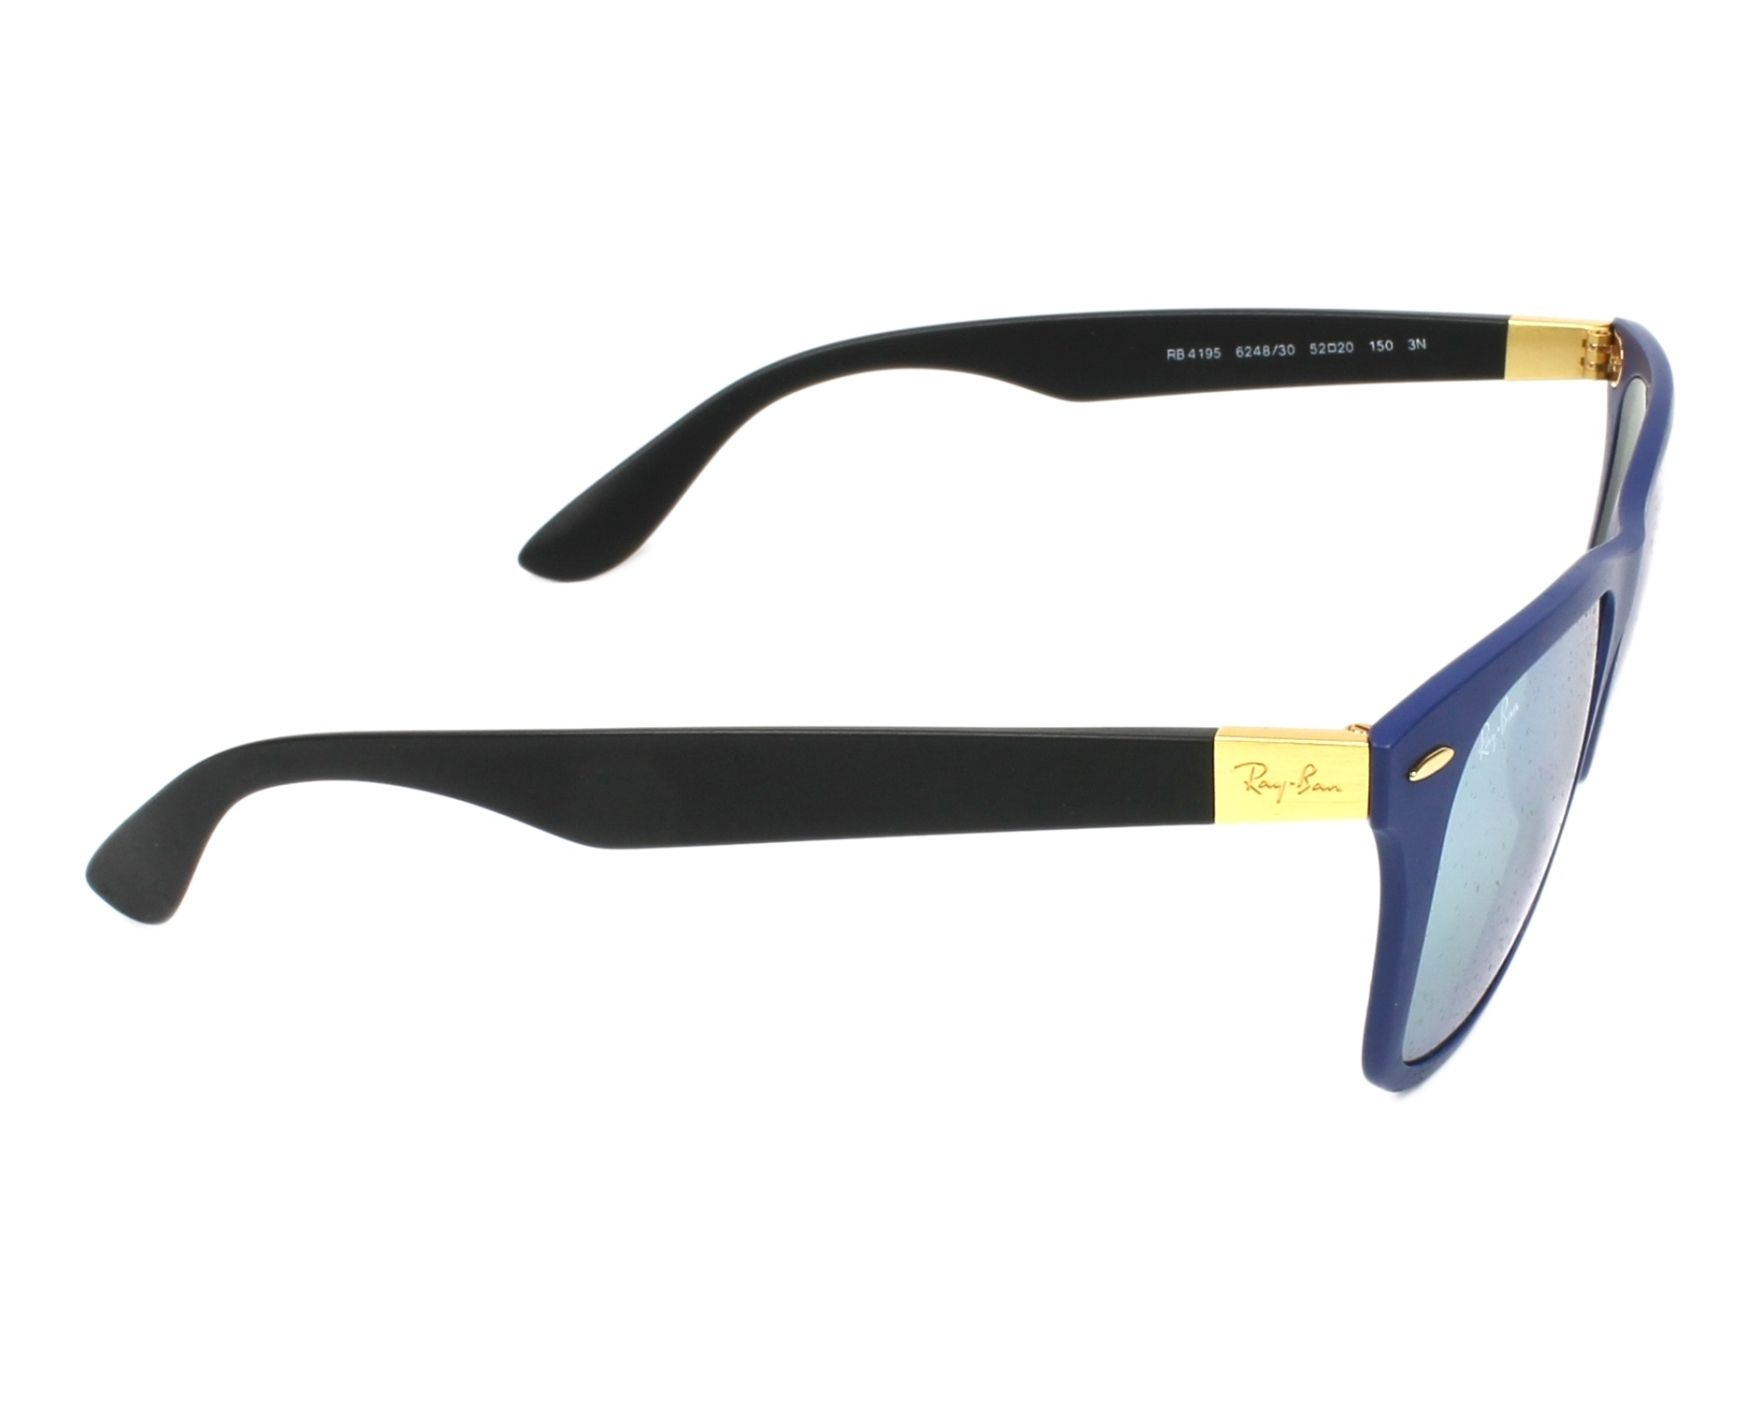 rayban sunglasses rb4195 624830 buy now and save 9